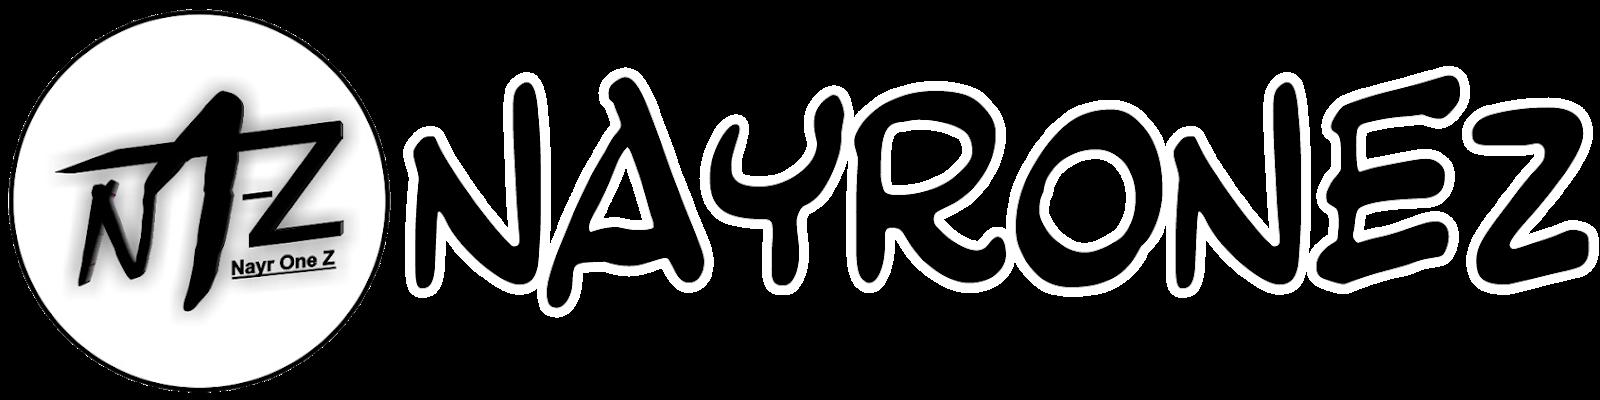 Nayronez